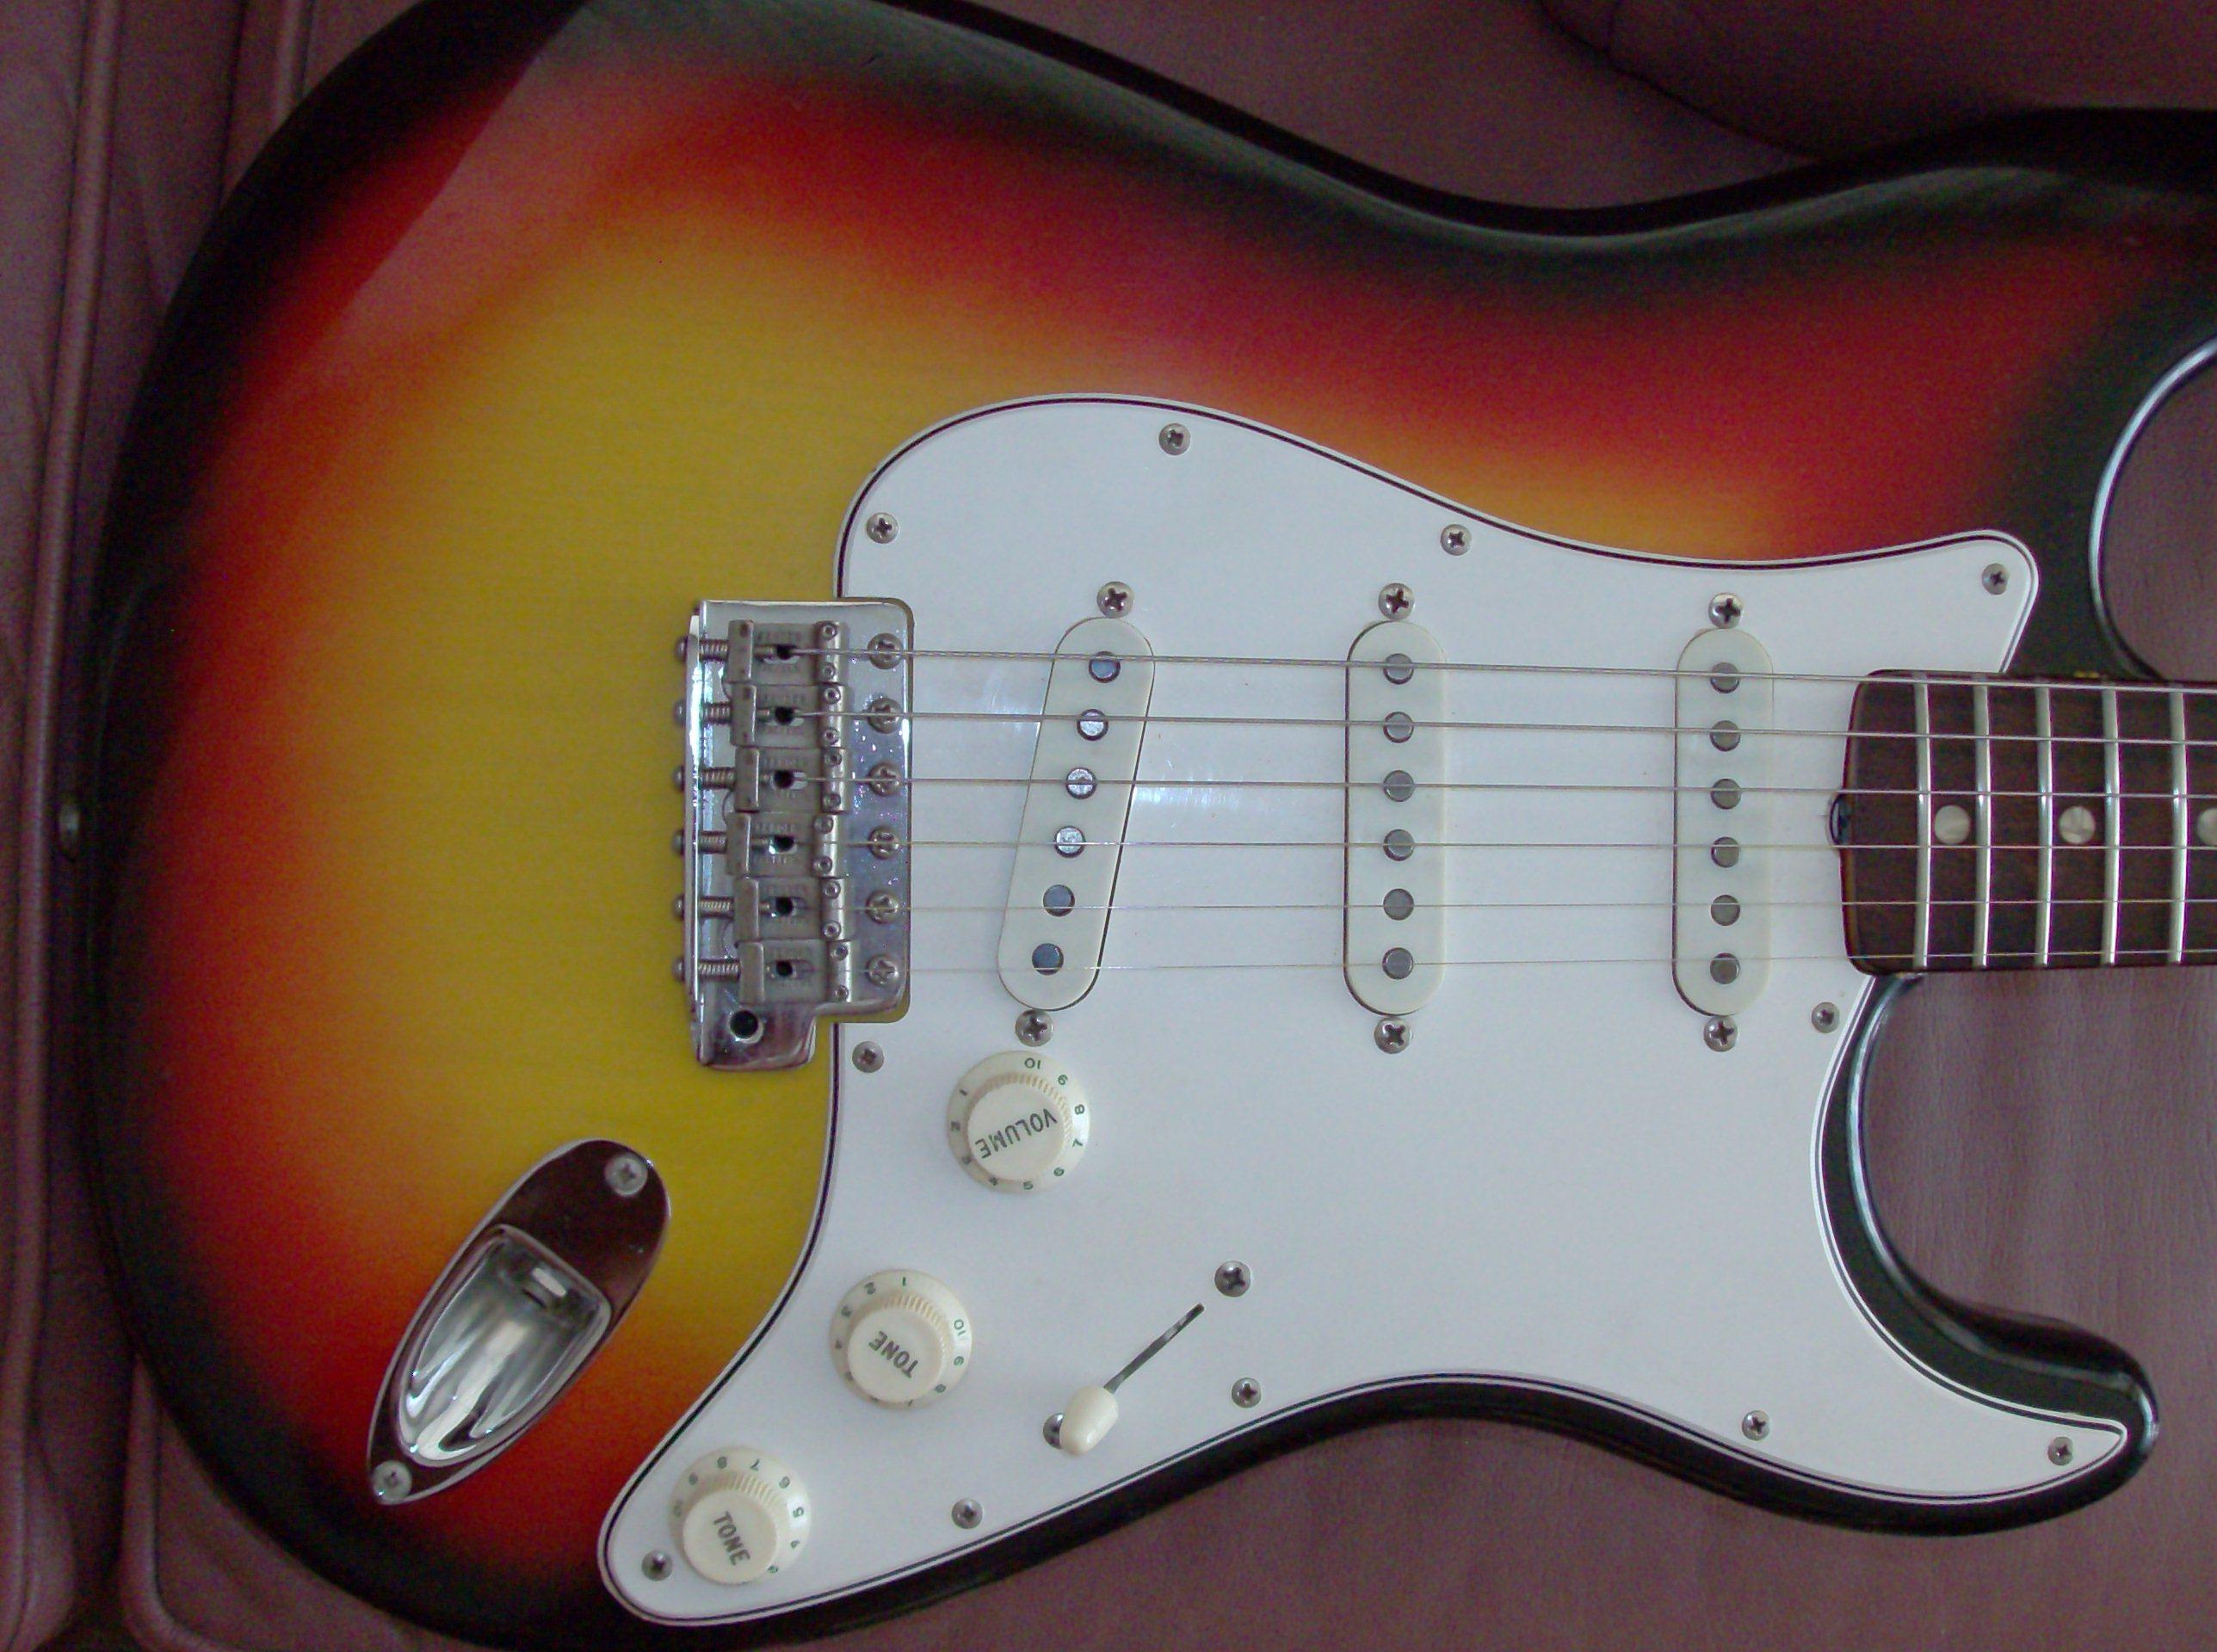 Fender Stratocaster 1965 Guitar For Sale